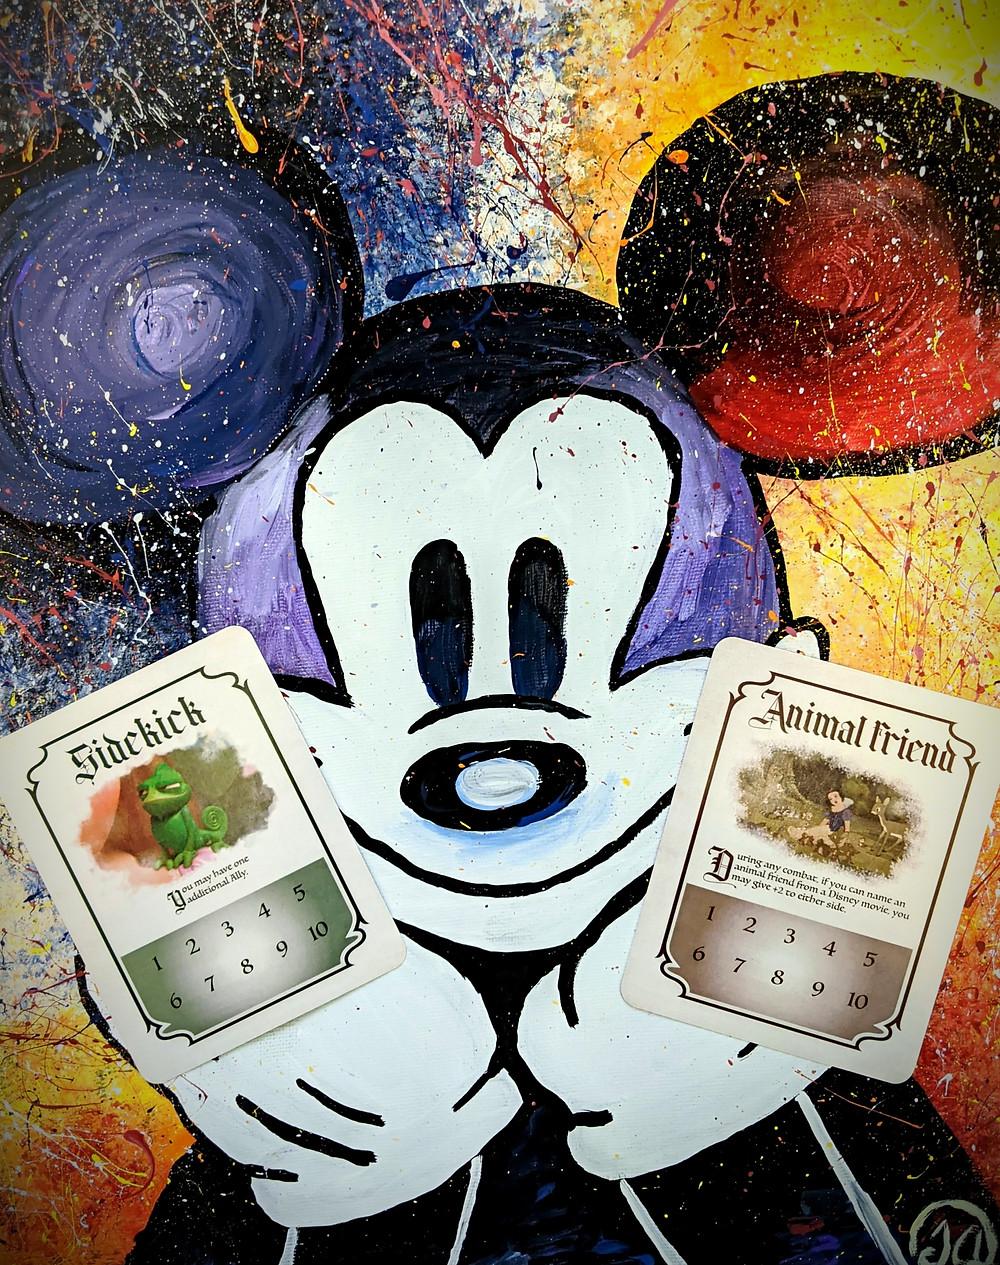 Munchkin: Disney Role Cards